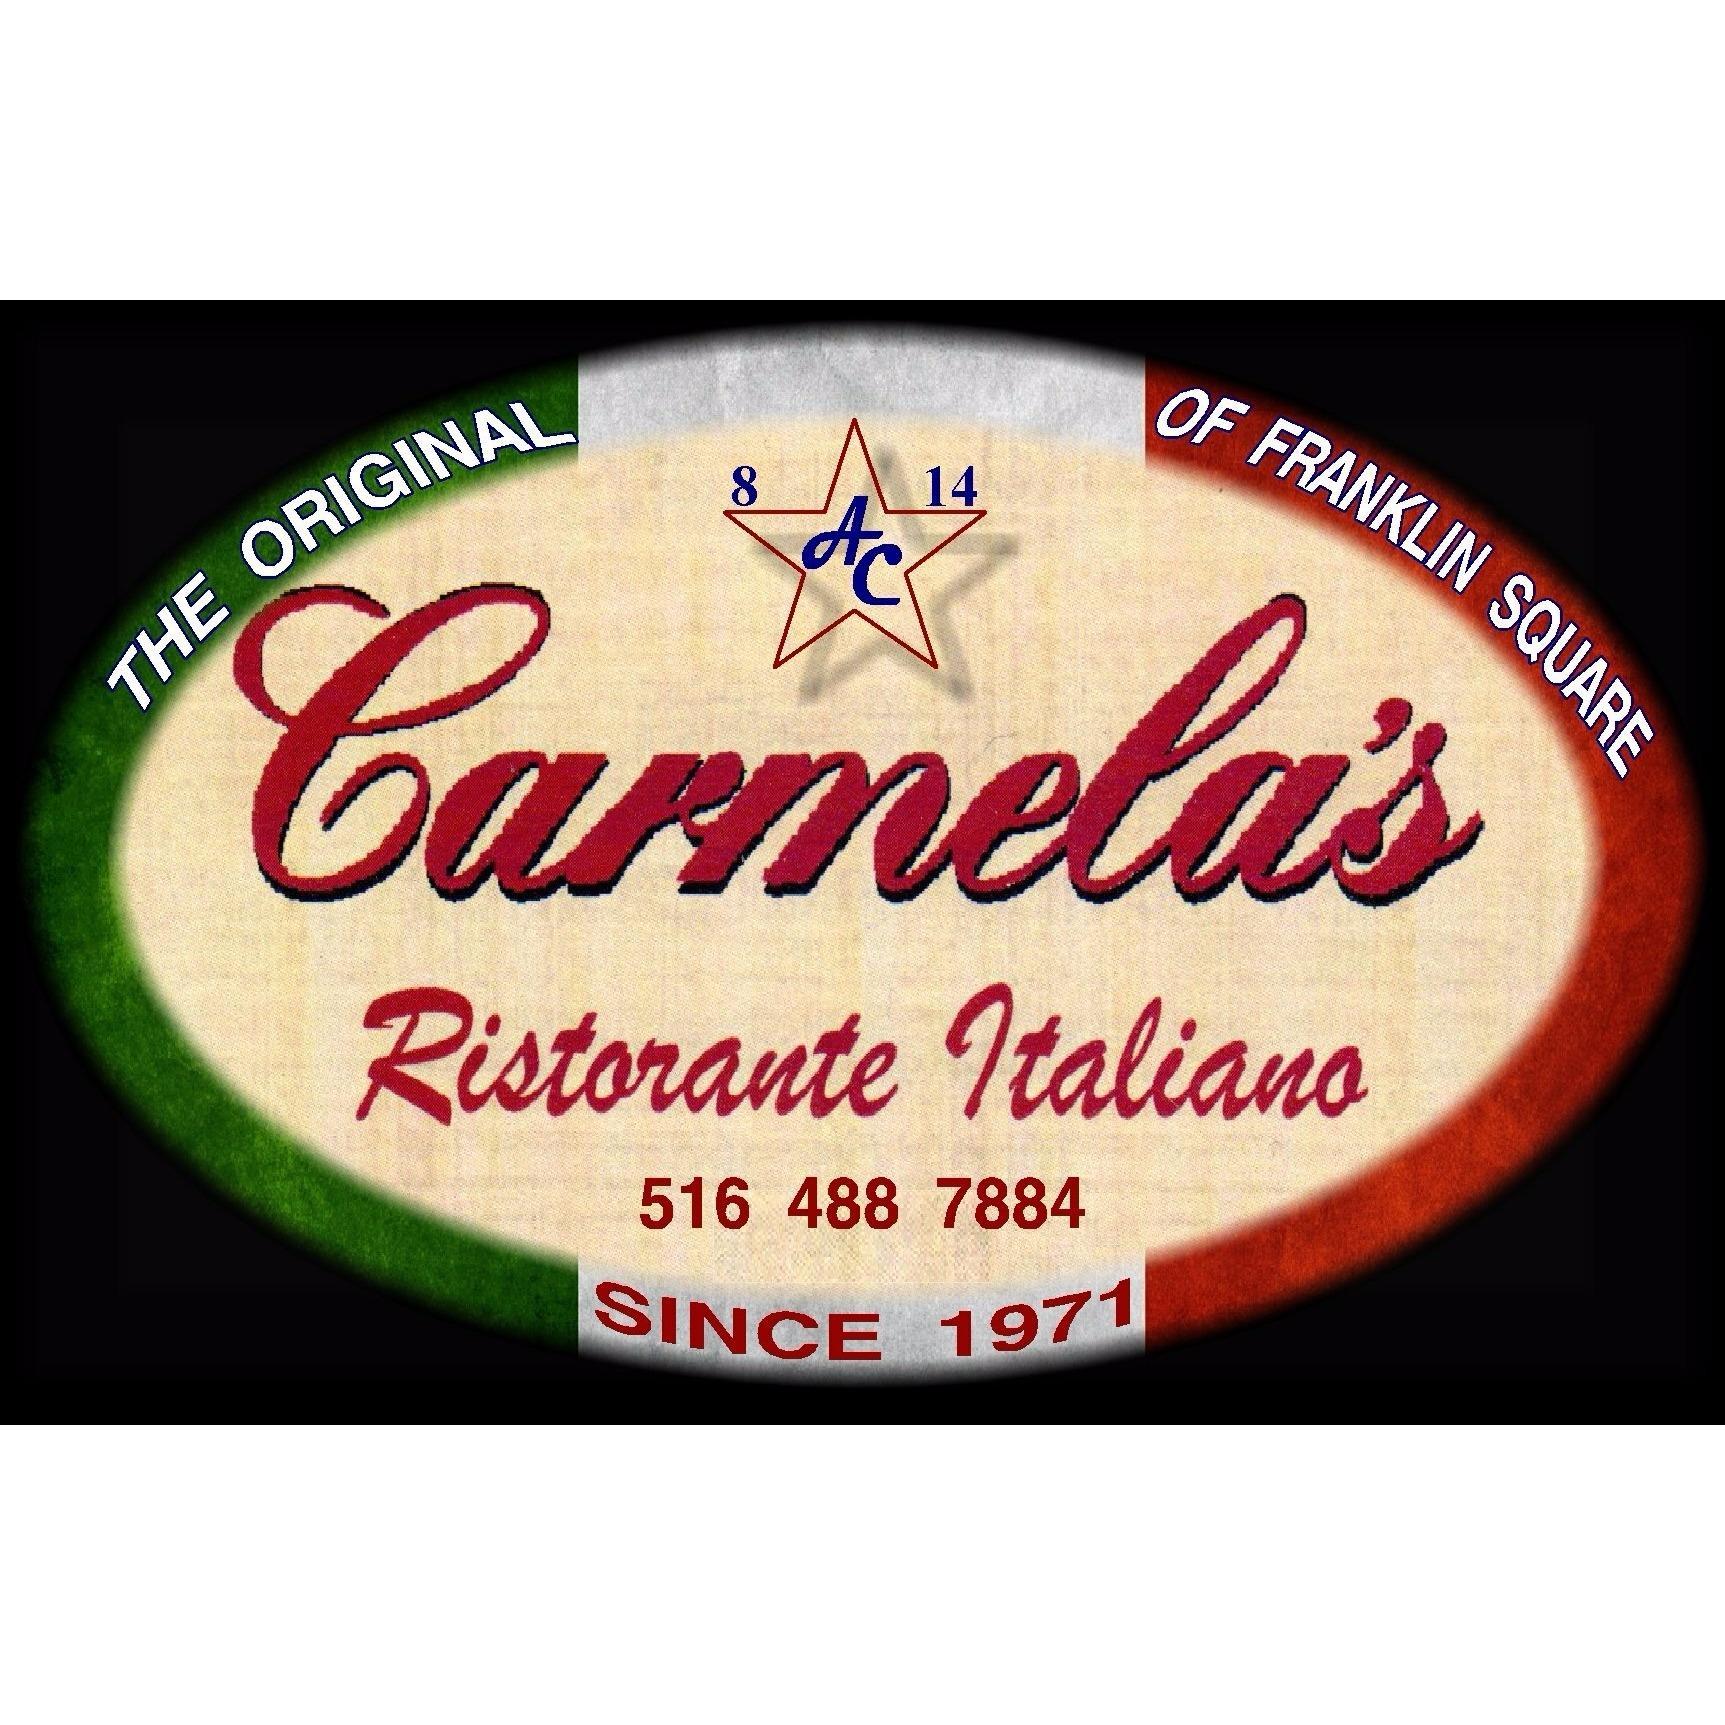 Carmela's Ristorante